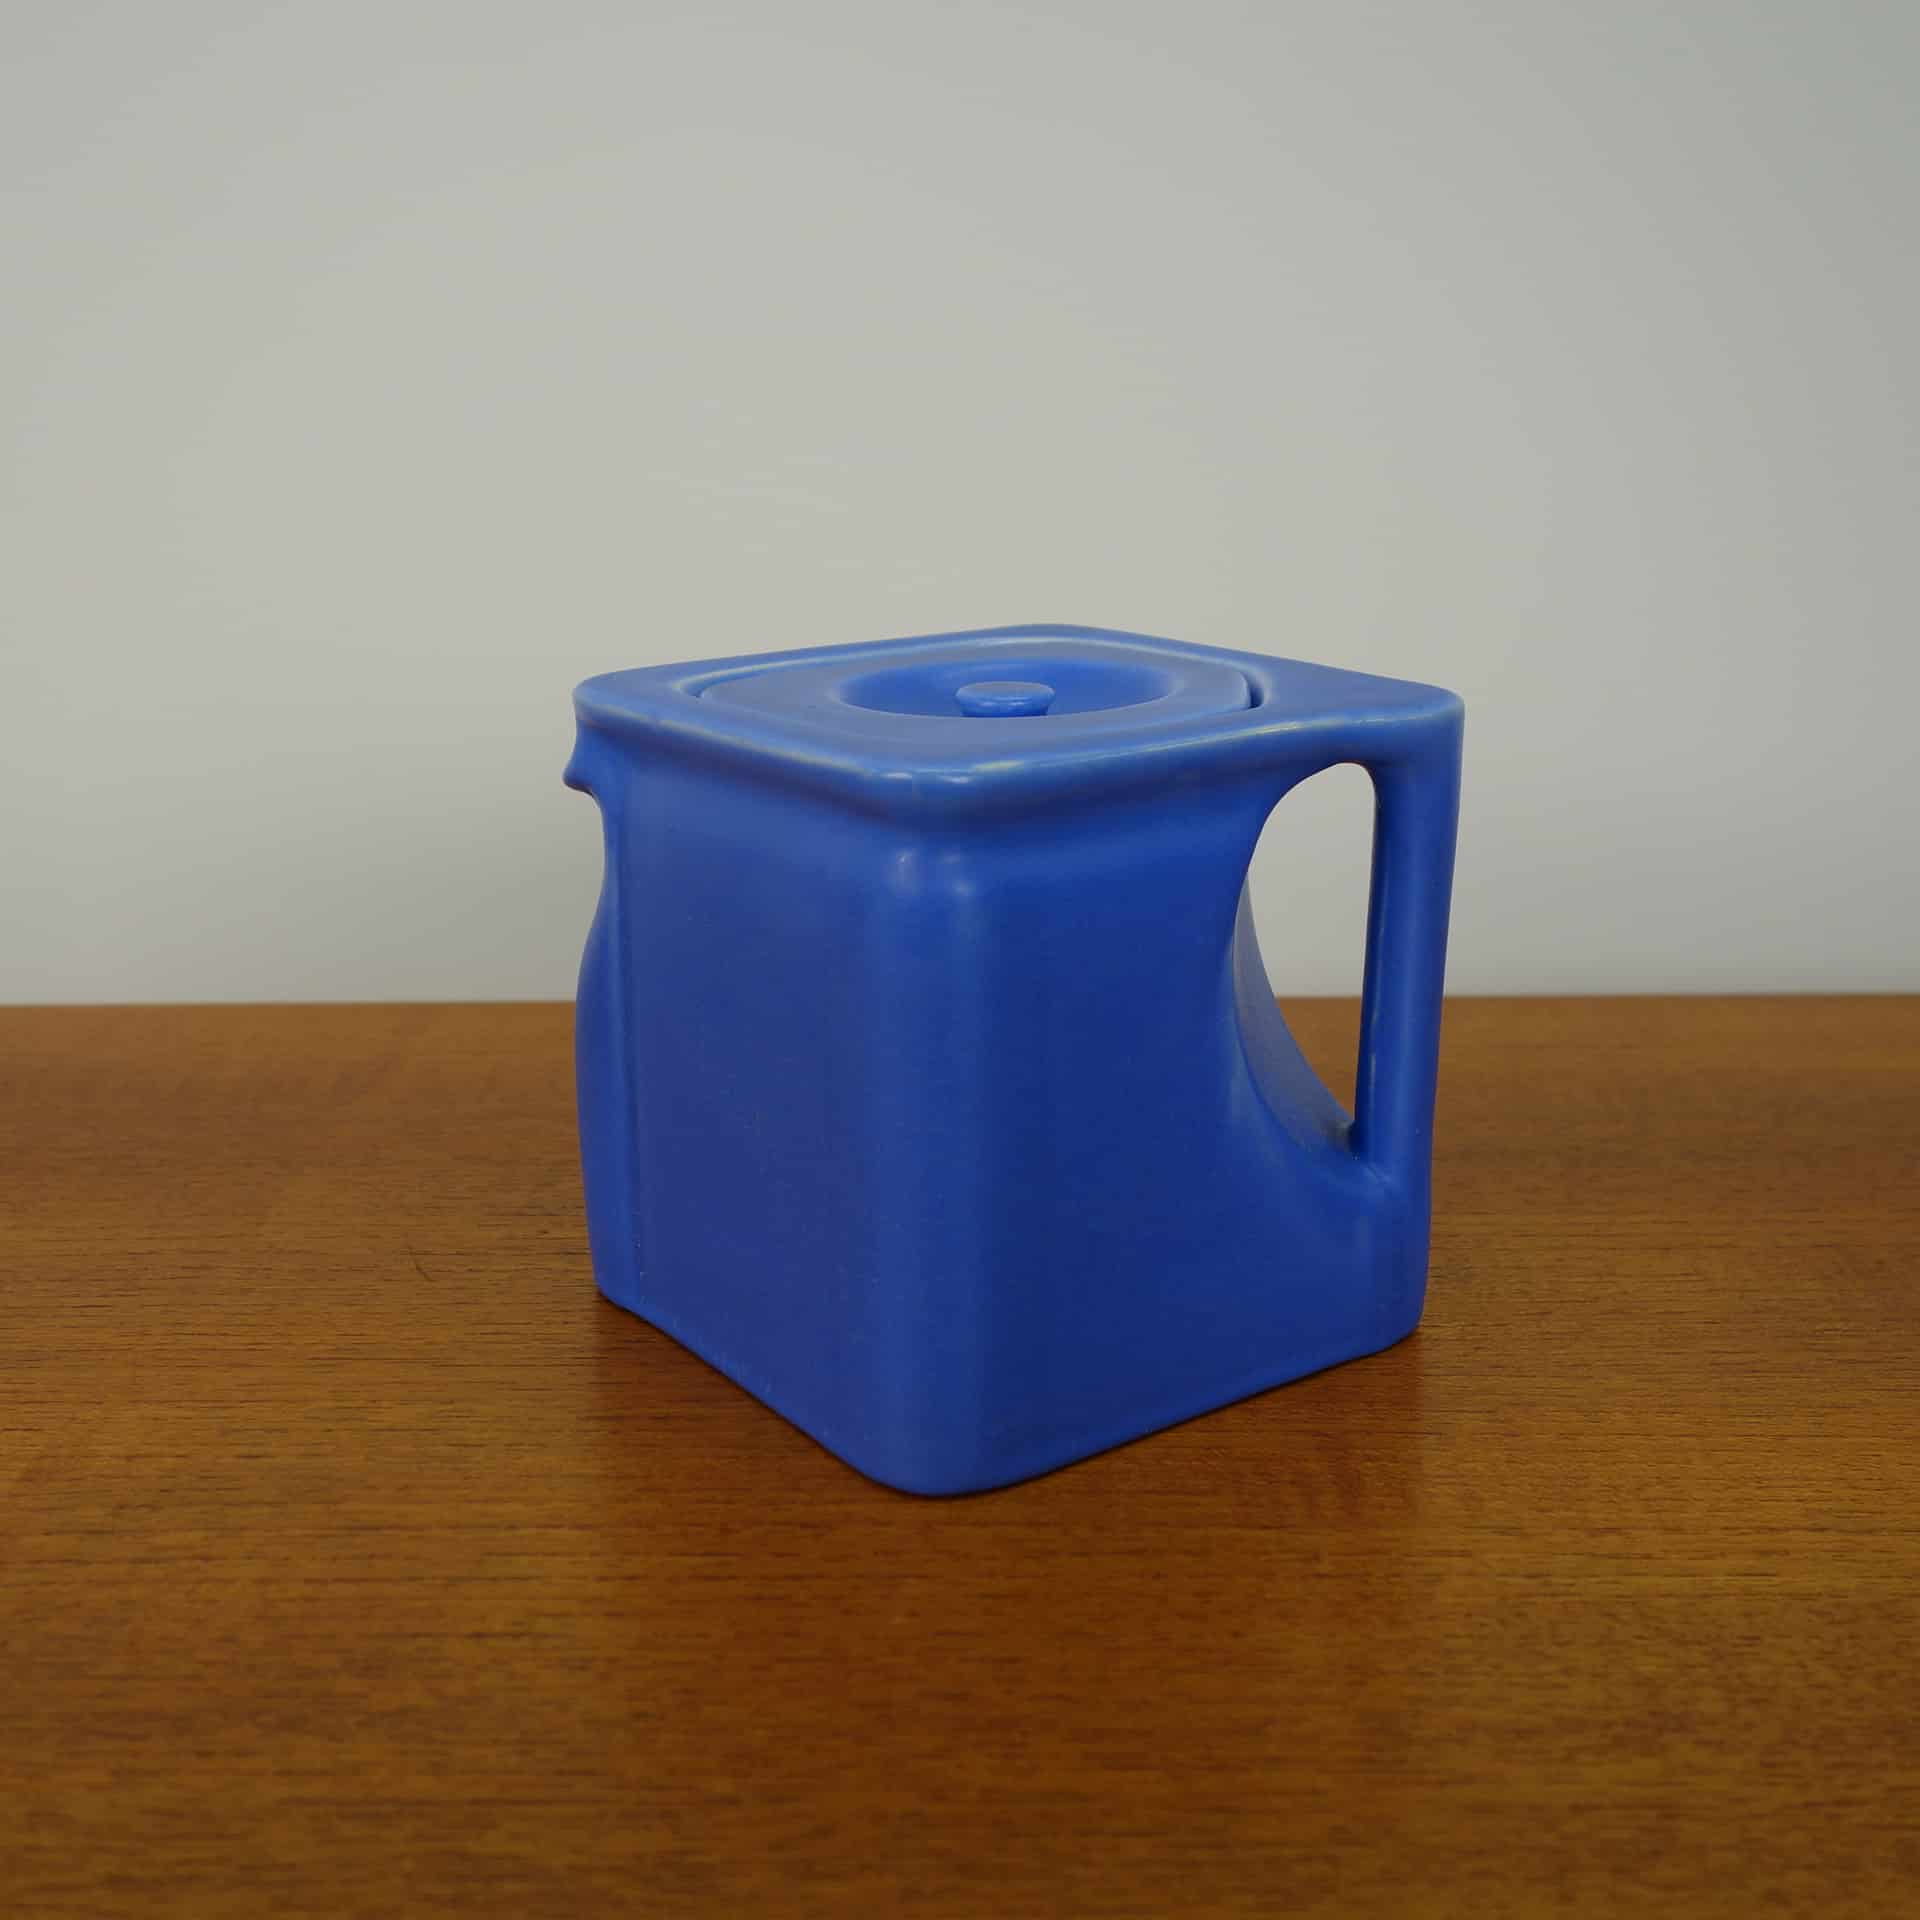 Original blue Cube tea pot from the 1920s